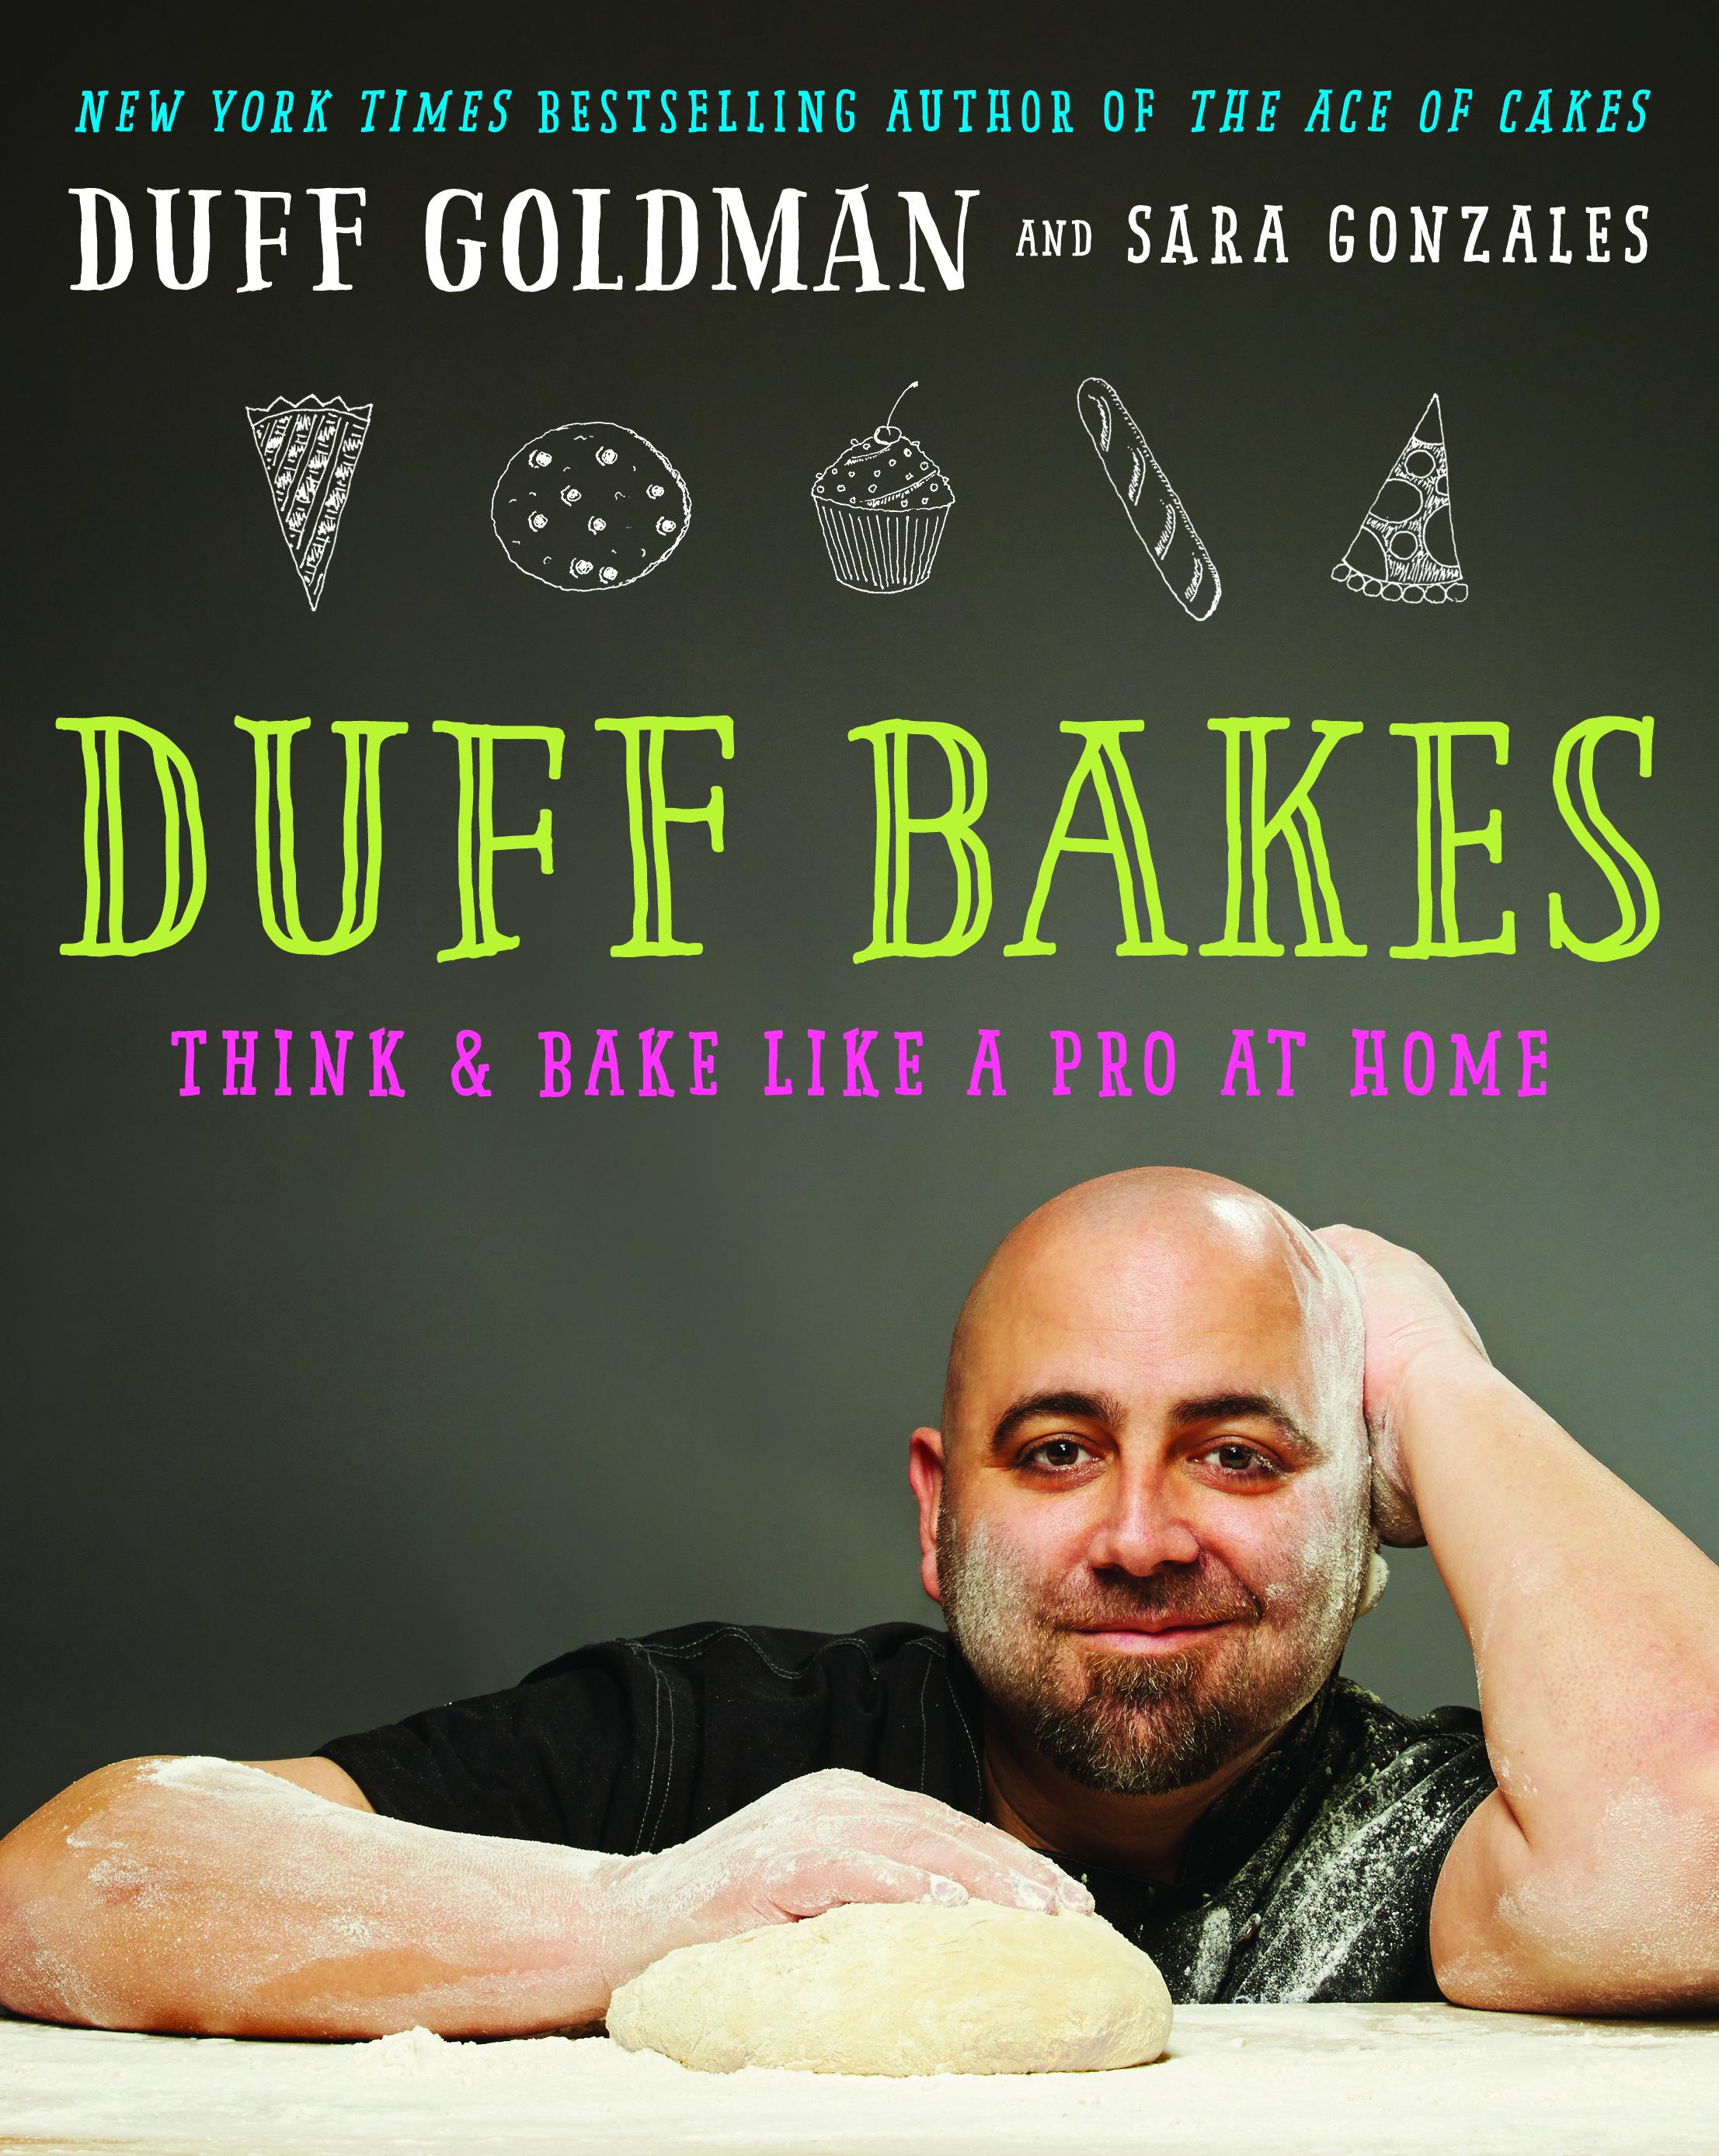 DuffBakes_HI (1).jpg